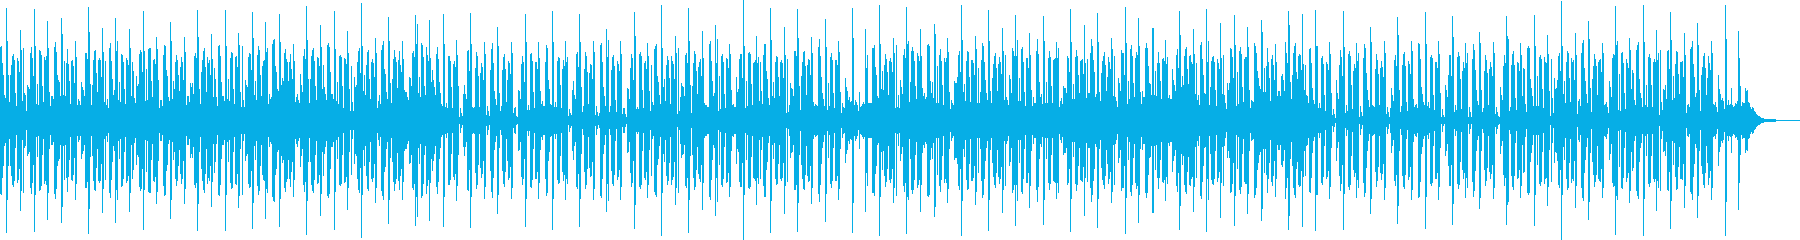 YouTubeエンディング・CM・EDMの再生済みの波形